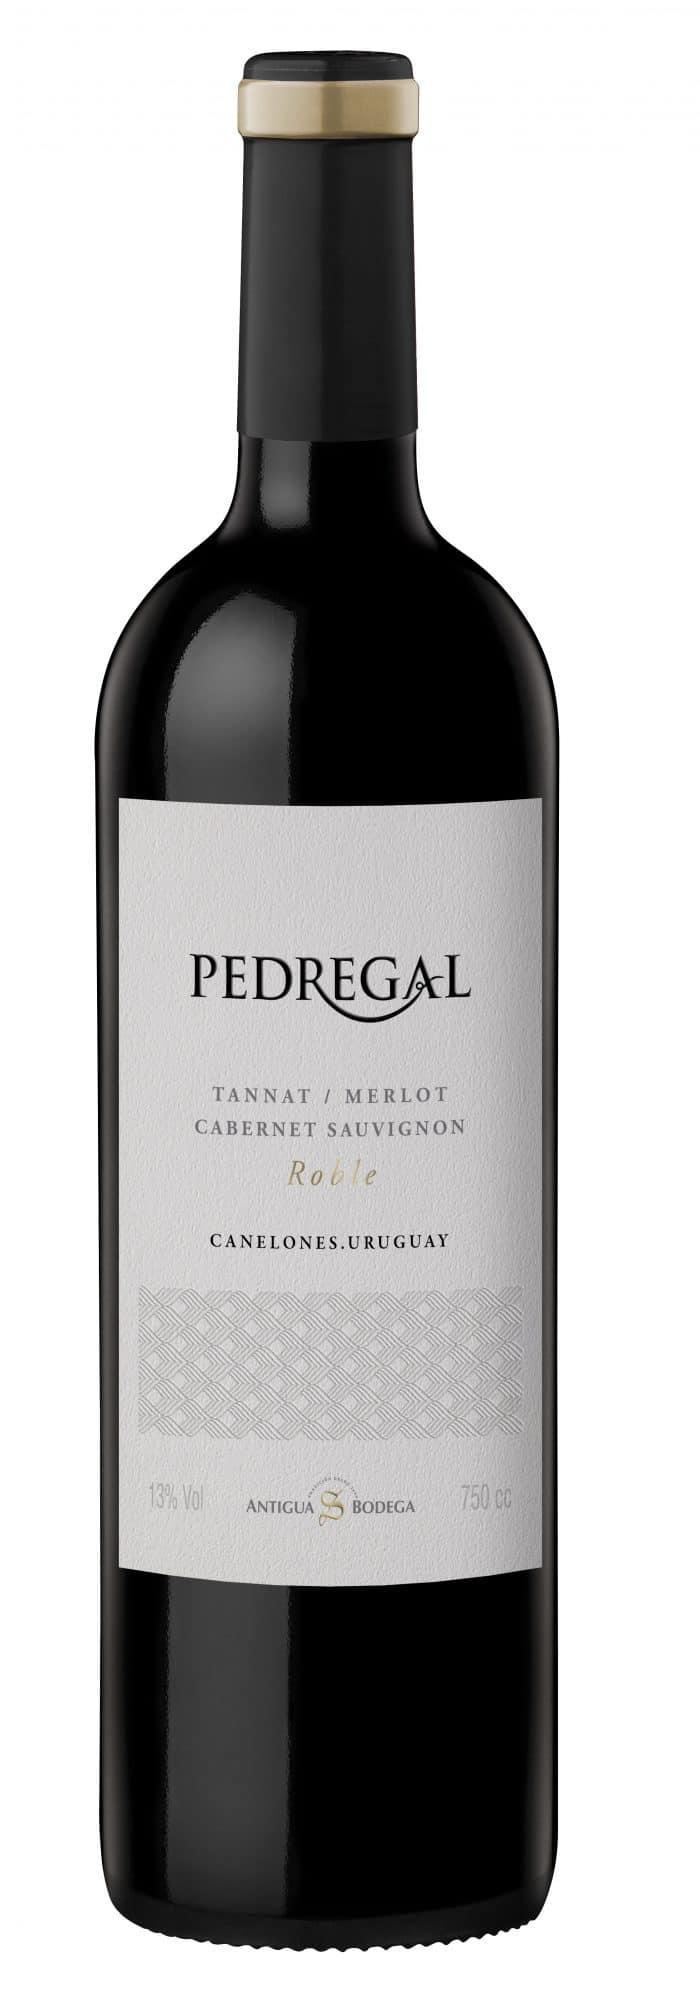 Pedregal – Tannat Merlot Cabernet Sauvignon | Uruguay | gemaakt van de druif: Cabernet Sauvignon, Merlot, tannat